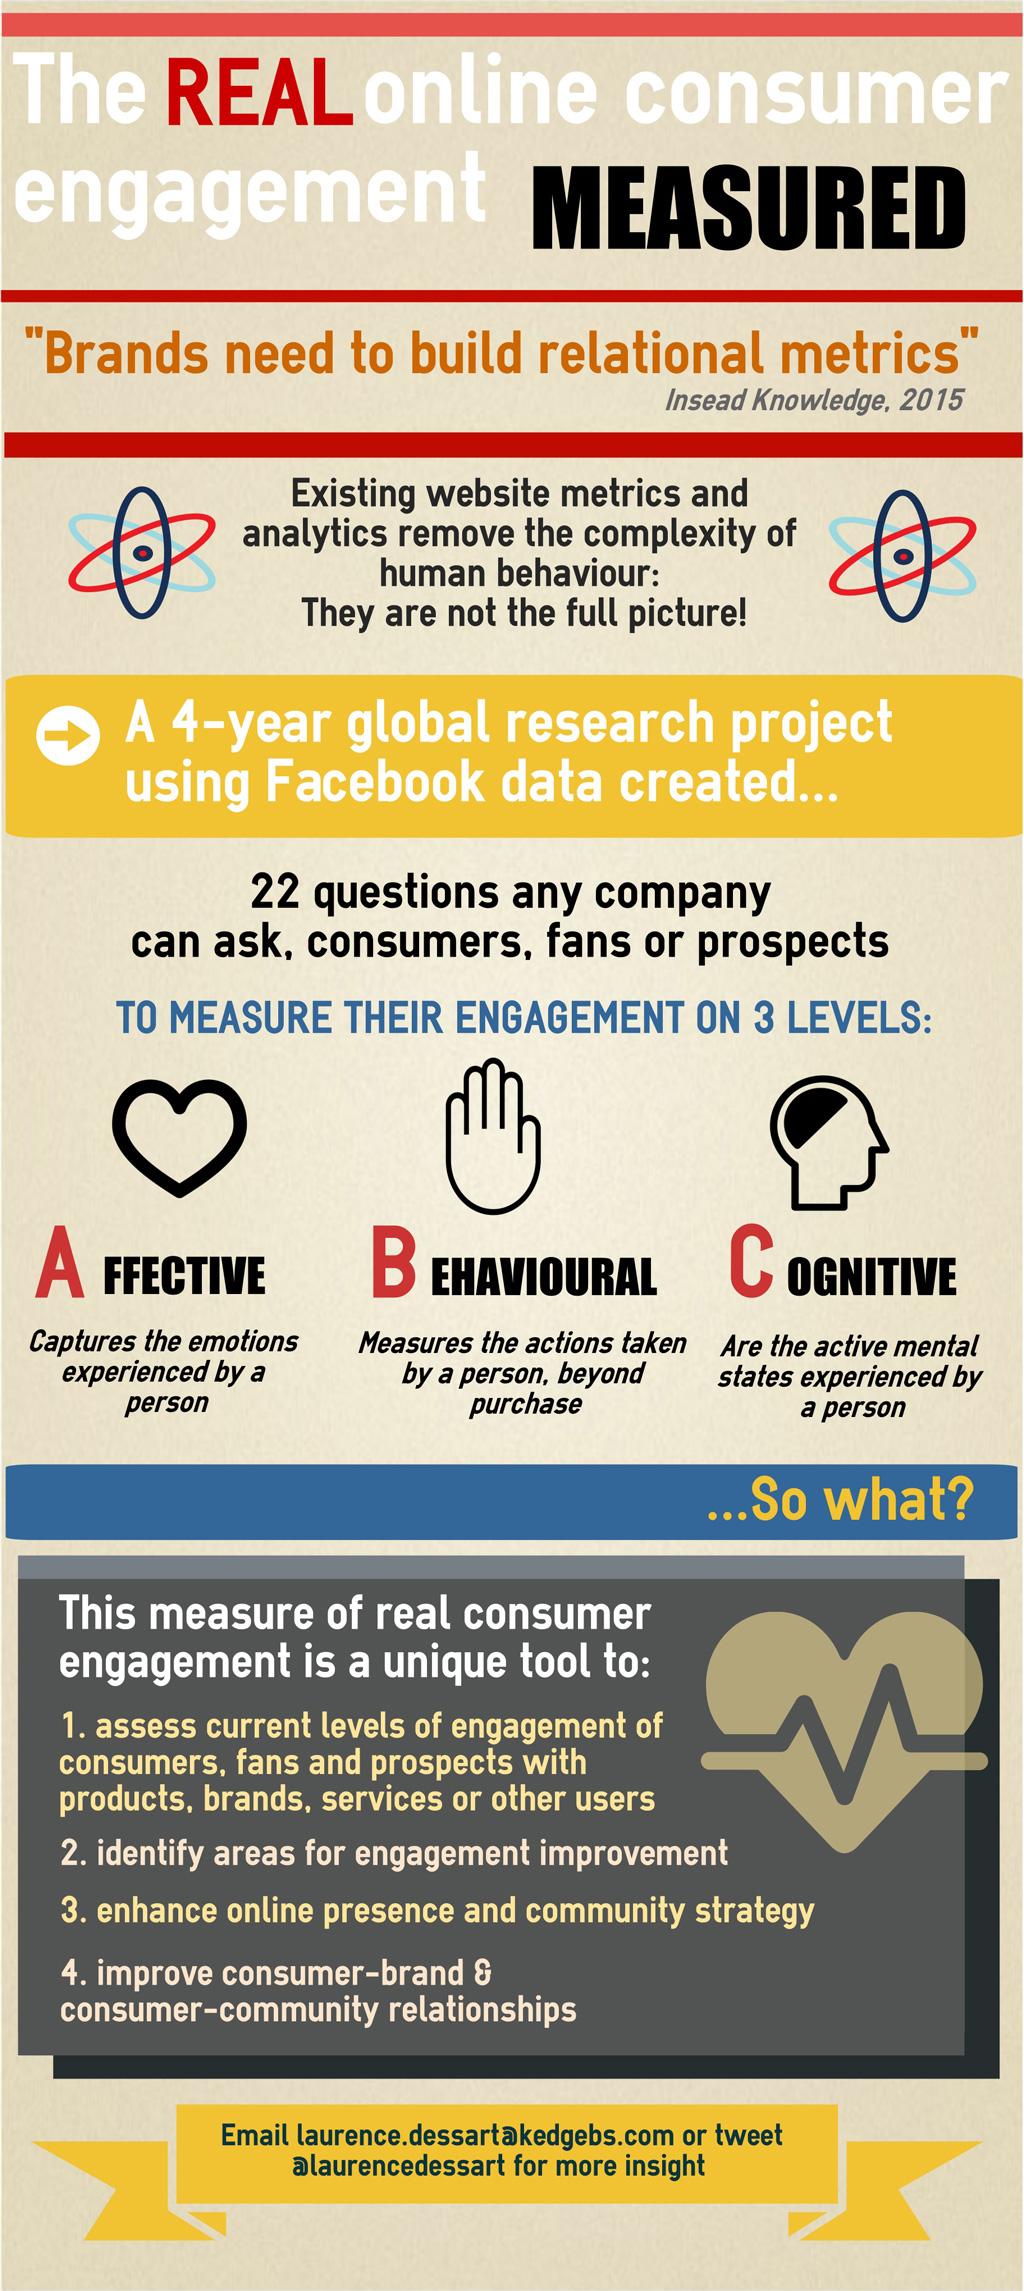 infographic, engagement, consumer engagement, emotion, thinking, action, behavior, behaviour, metric, measure, score